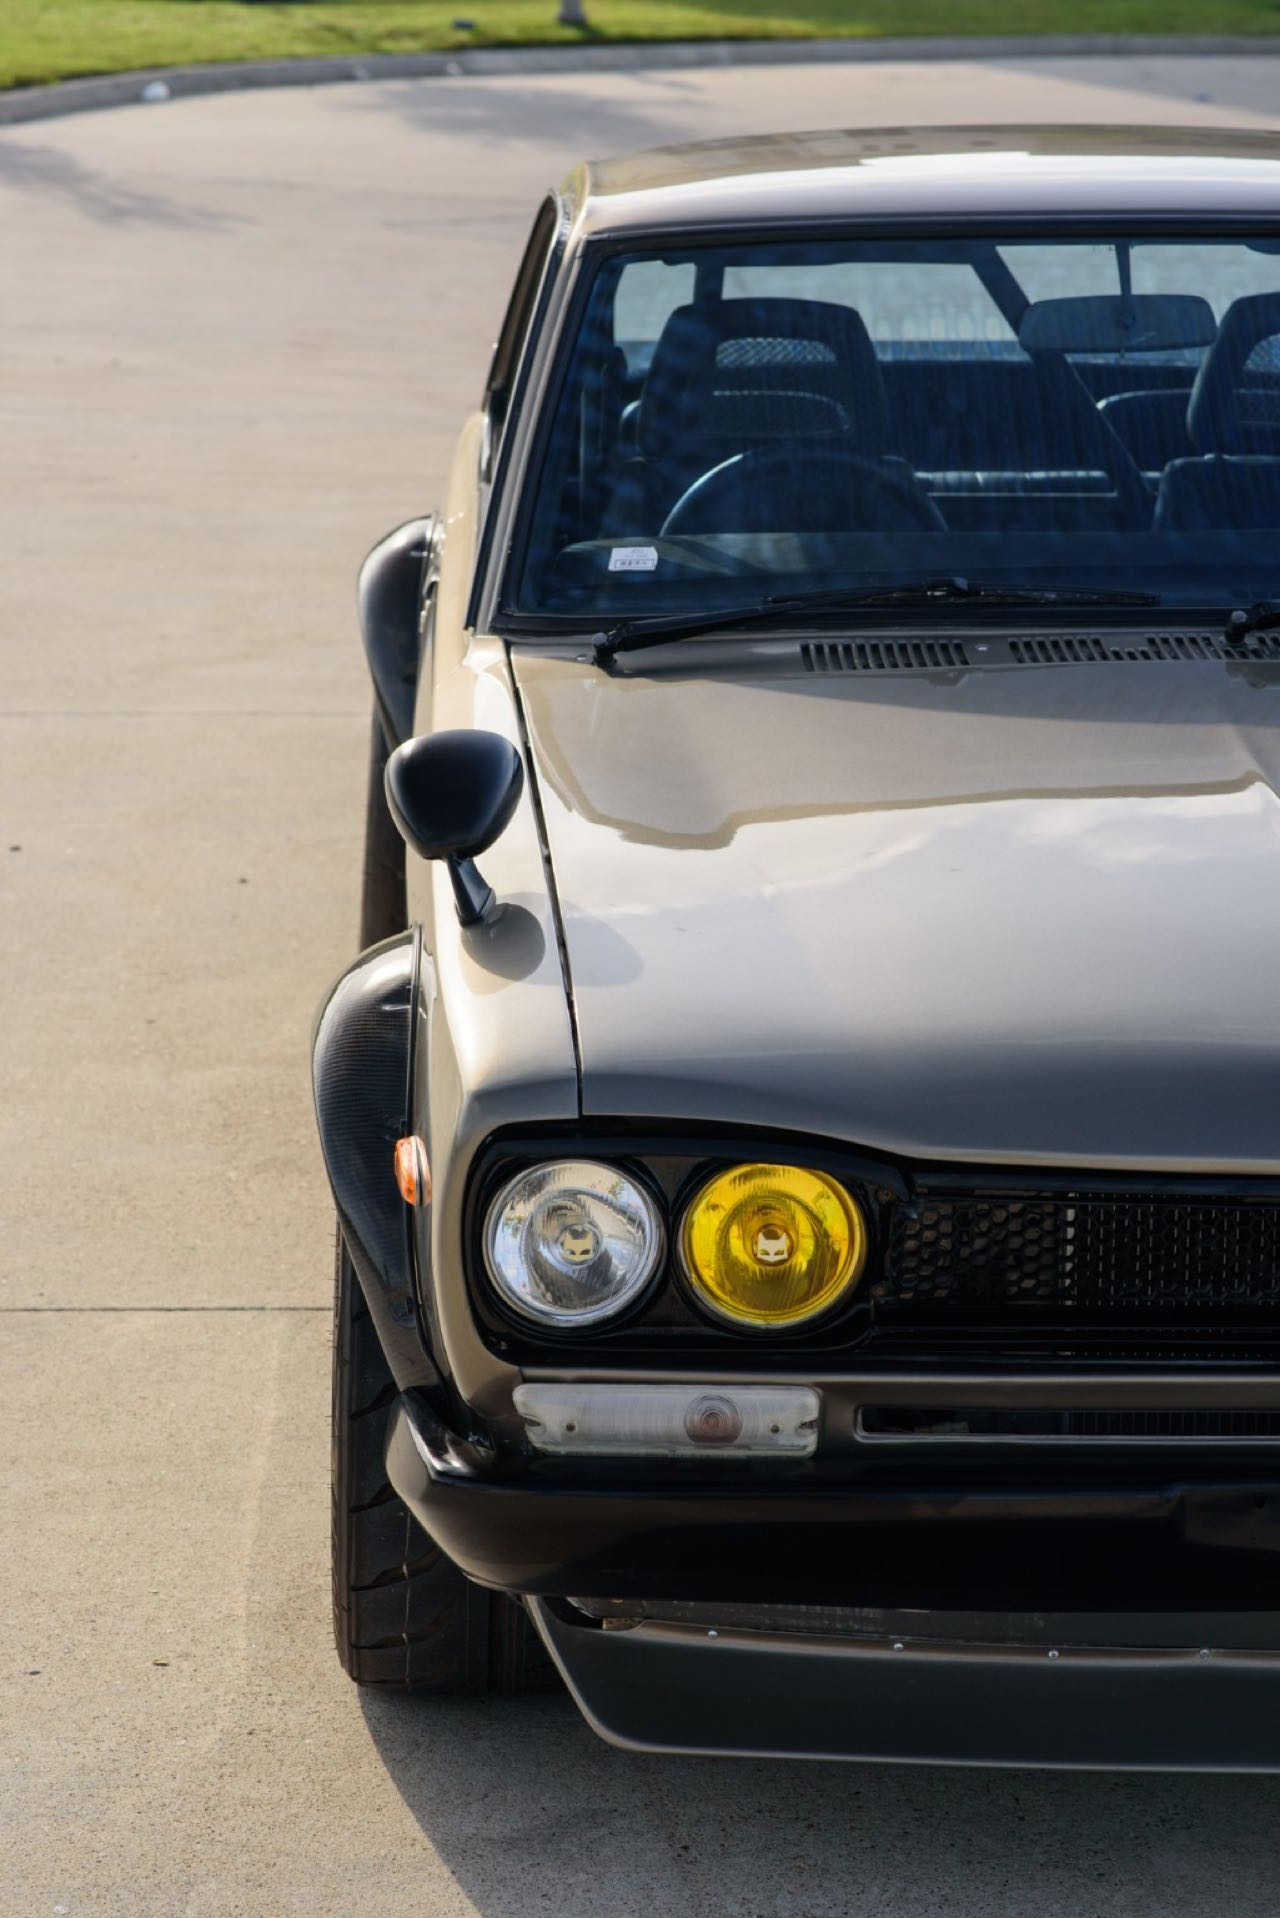 '72 Nissan Skyline KPGC10 Replica - Si tu lèves le capot... 9